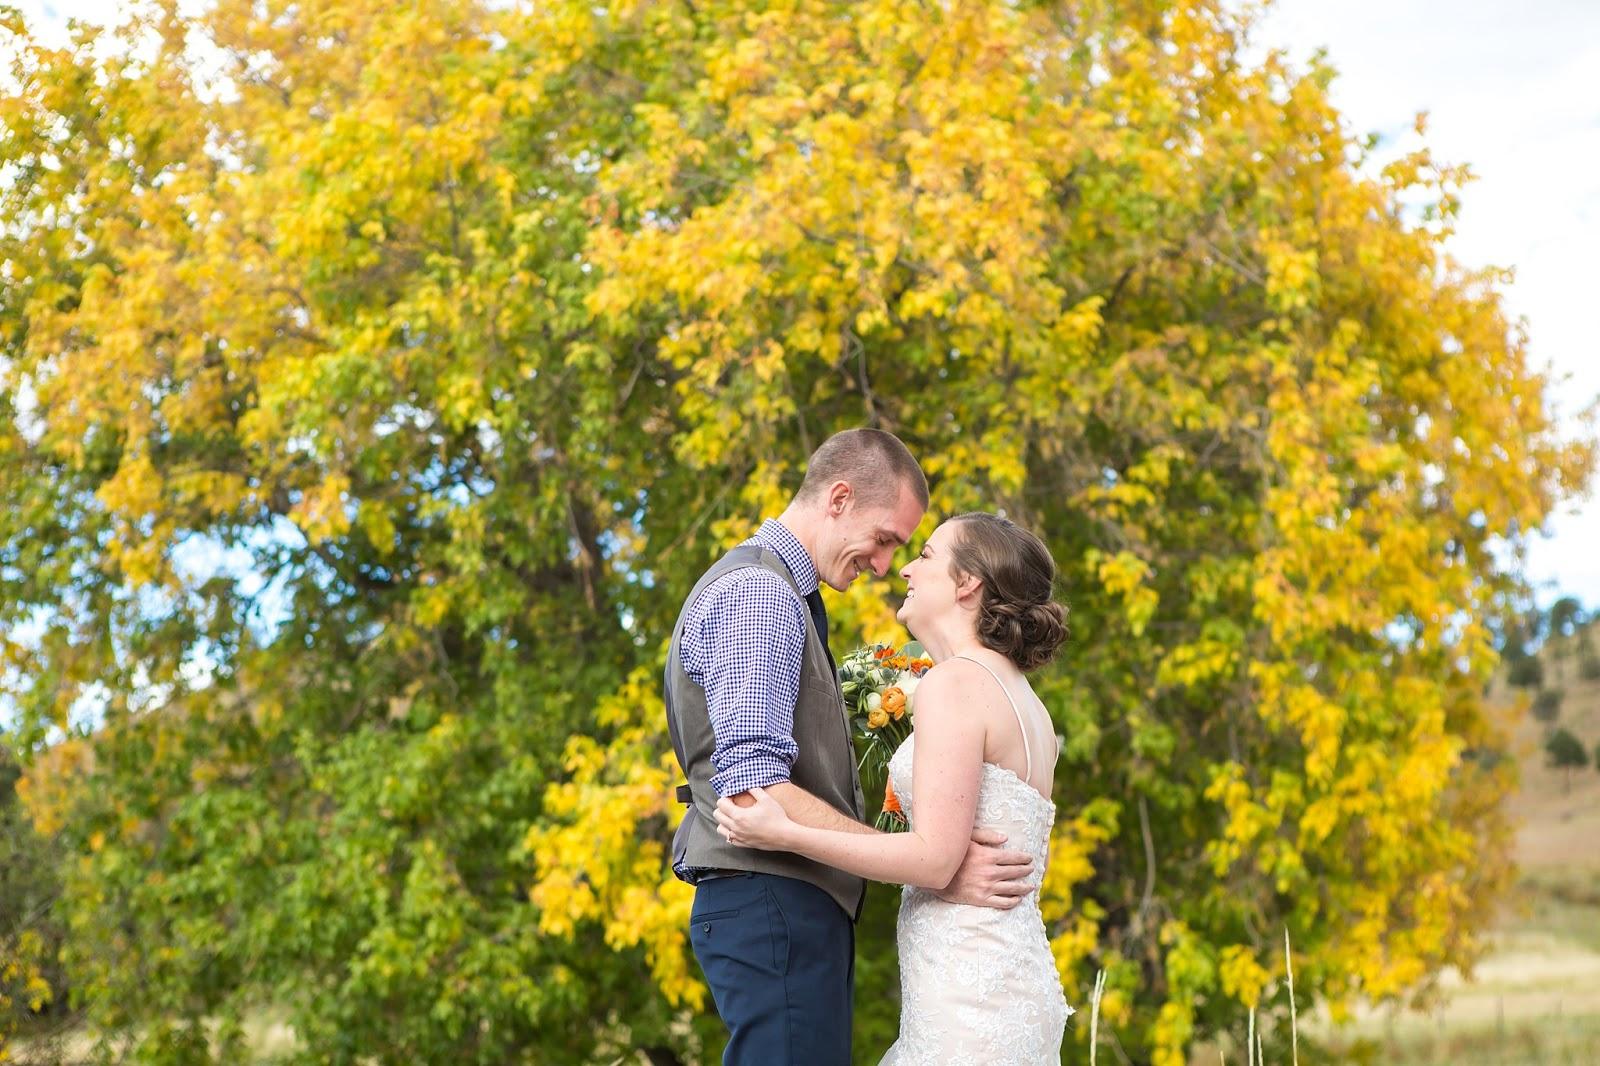 Phoenix Wedding Photographer - Jenn Wagner Photography - Studio Blog ...